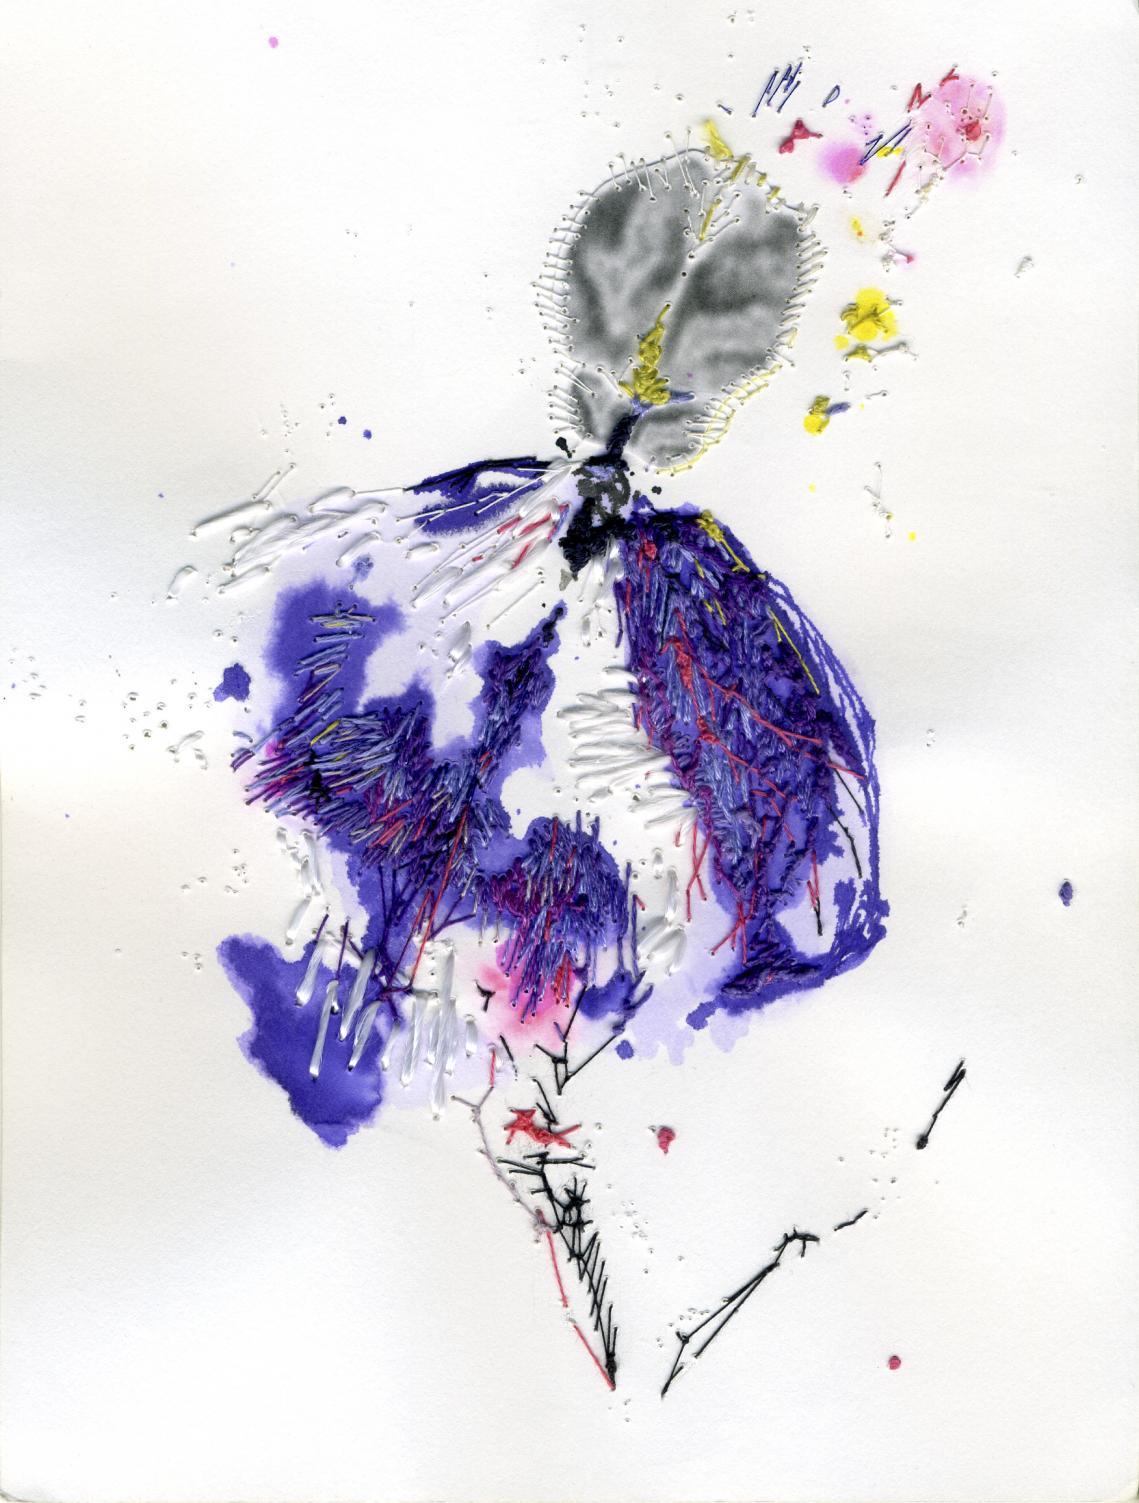 Lirios (I) (2020) - Bárbara G. F. Muriel